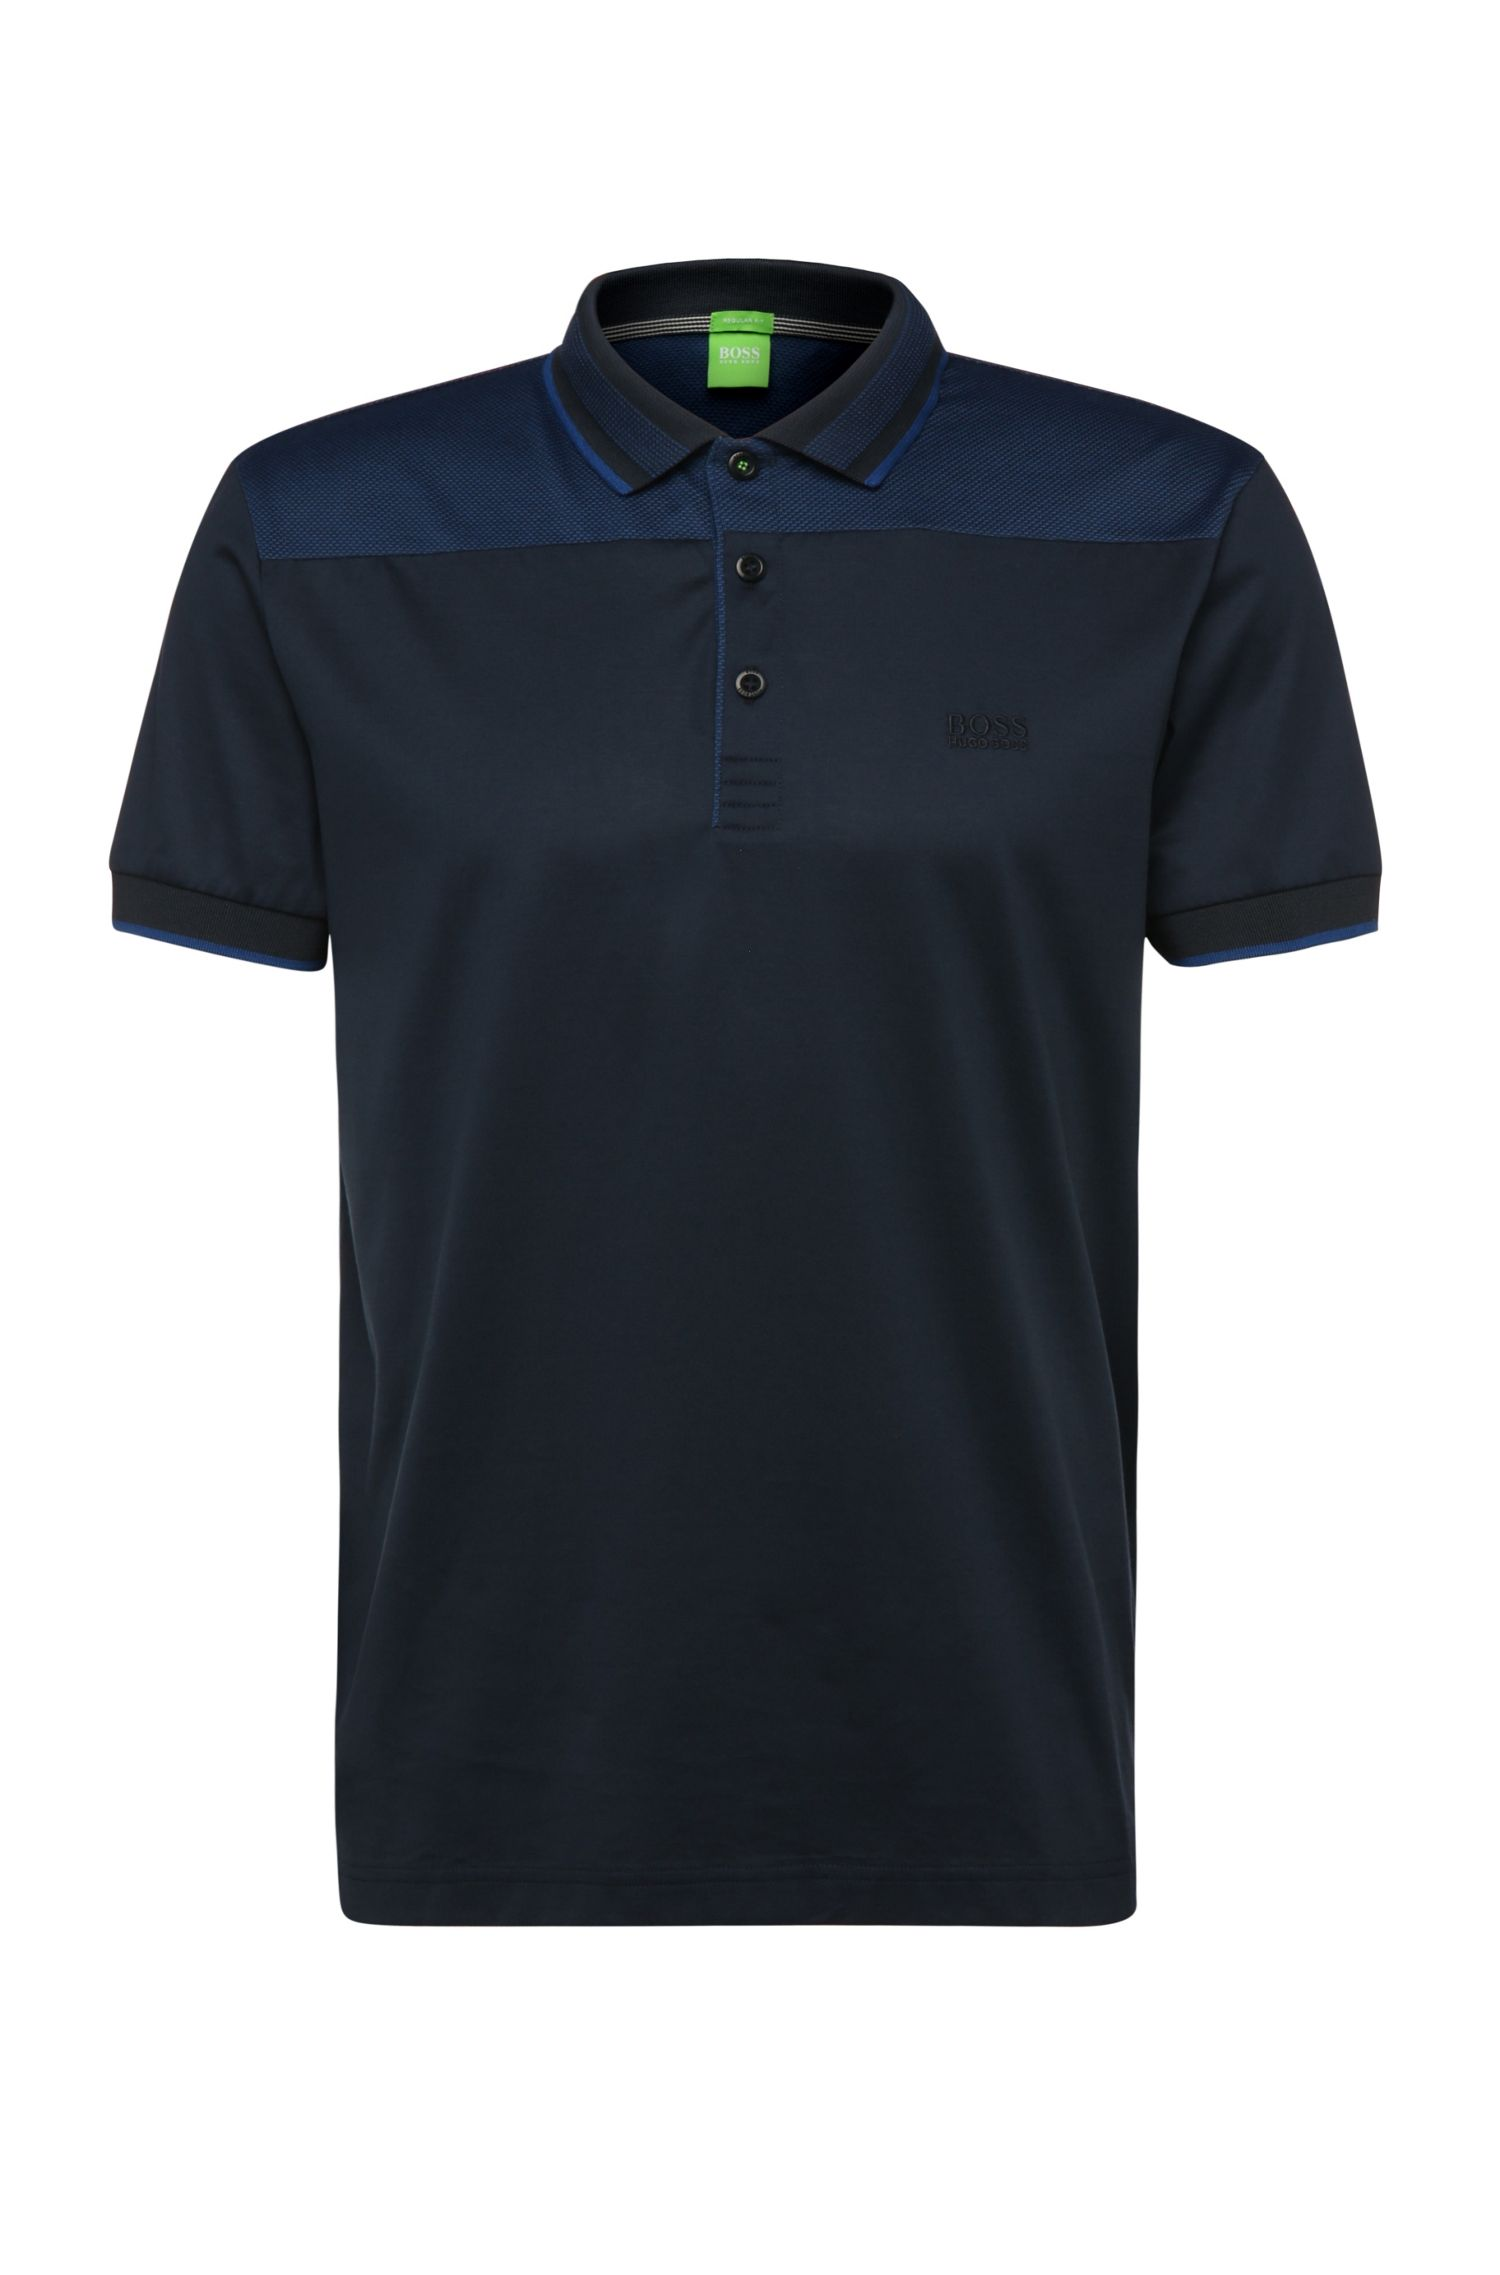 Regular-Fit Poloshirt aus Baumwolle mit Kontrast-Besatz: ´Pavel`